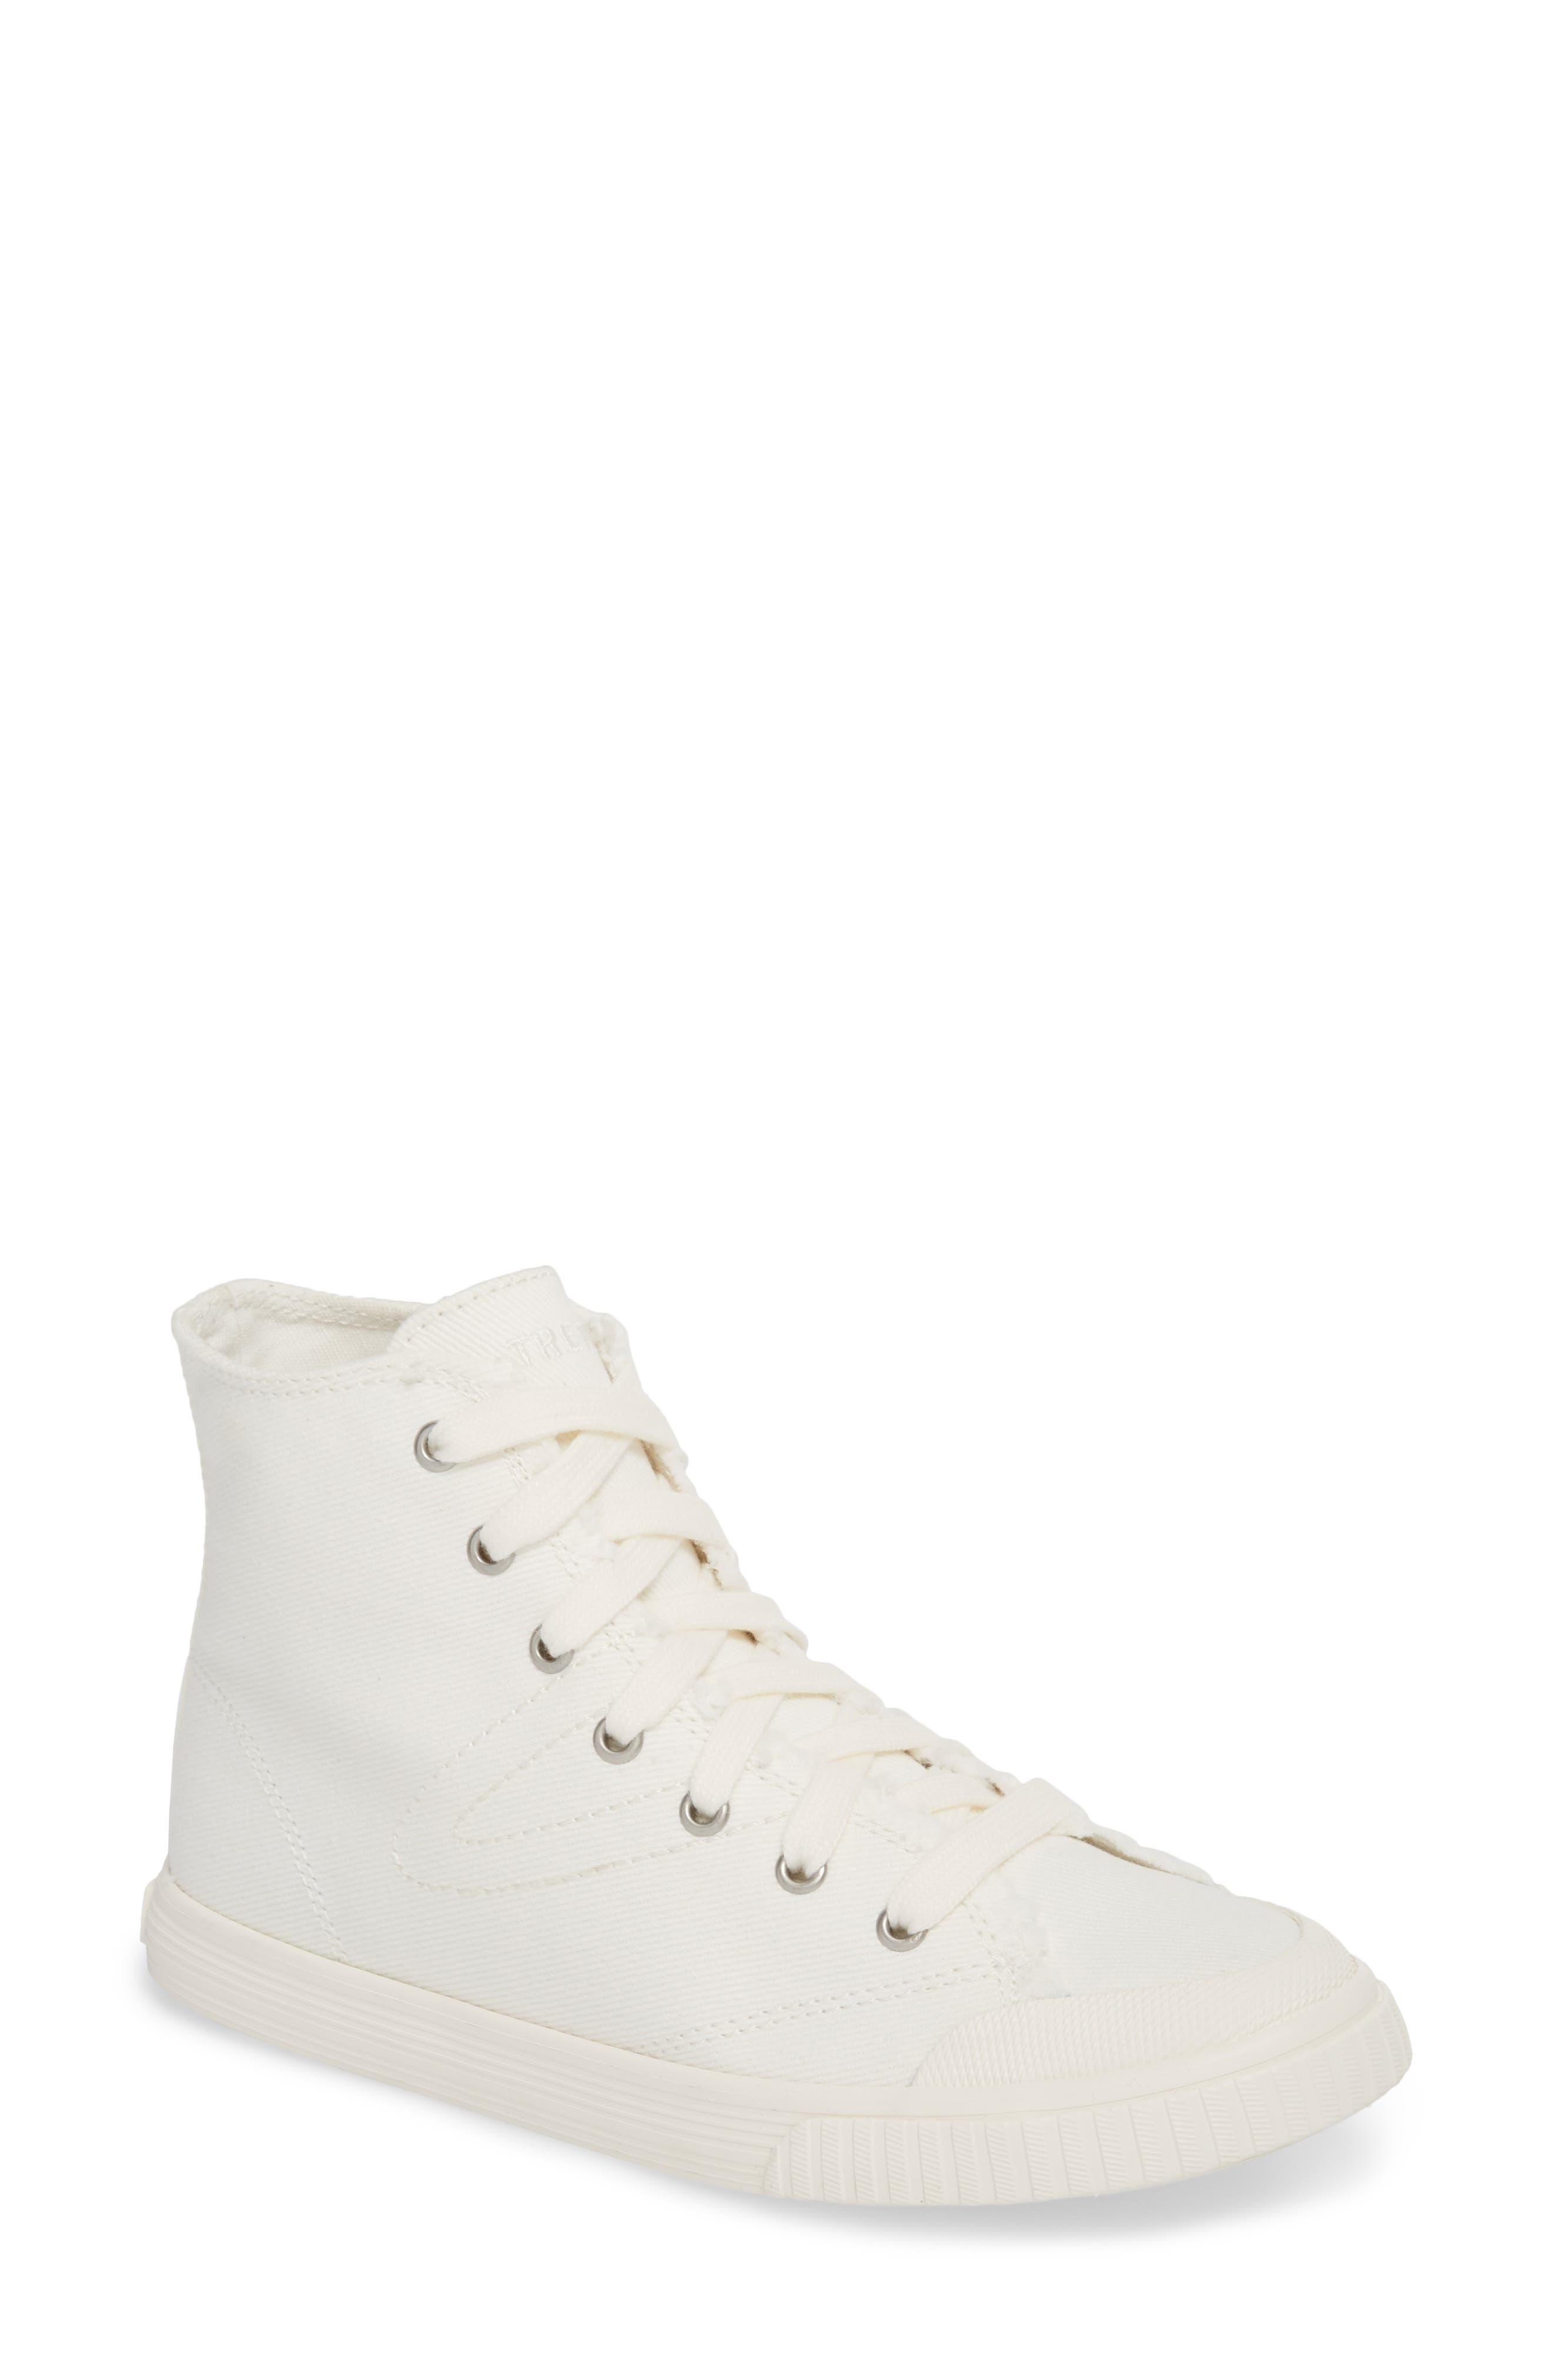 Marley 2 High Top Sneaker,                         Main,                         color, 150